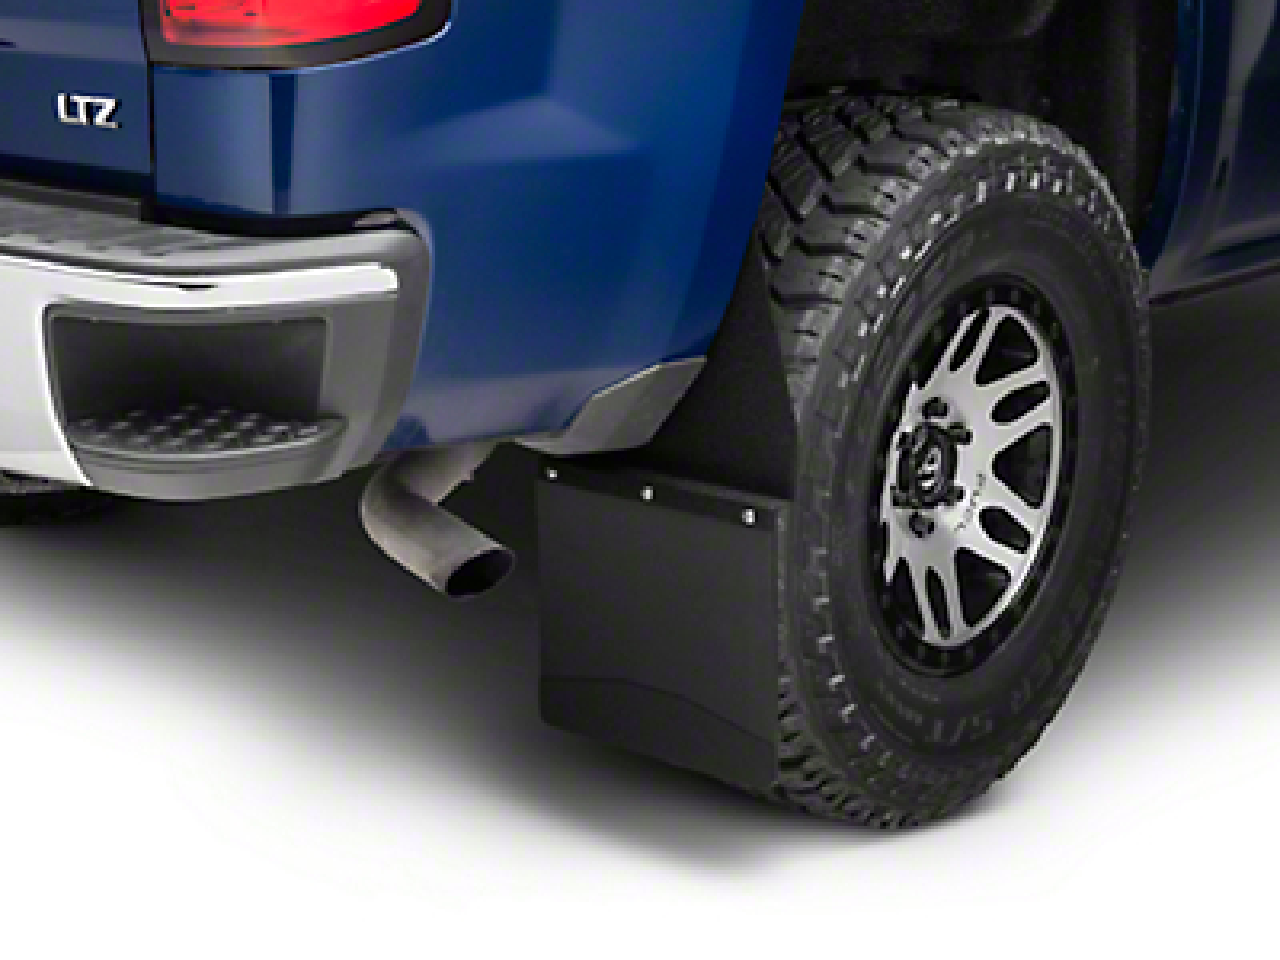 Husky 12 in. Wide KickBack Mud Flaps - Textured Black Top & Weight (07-18 Silverado 1500)